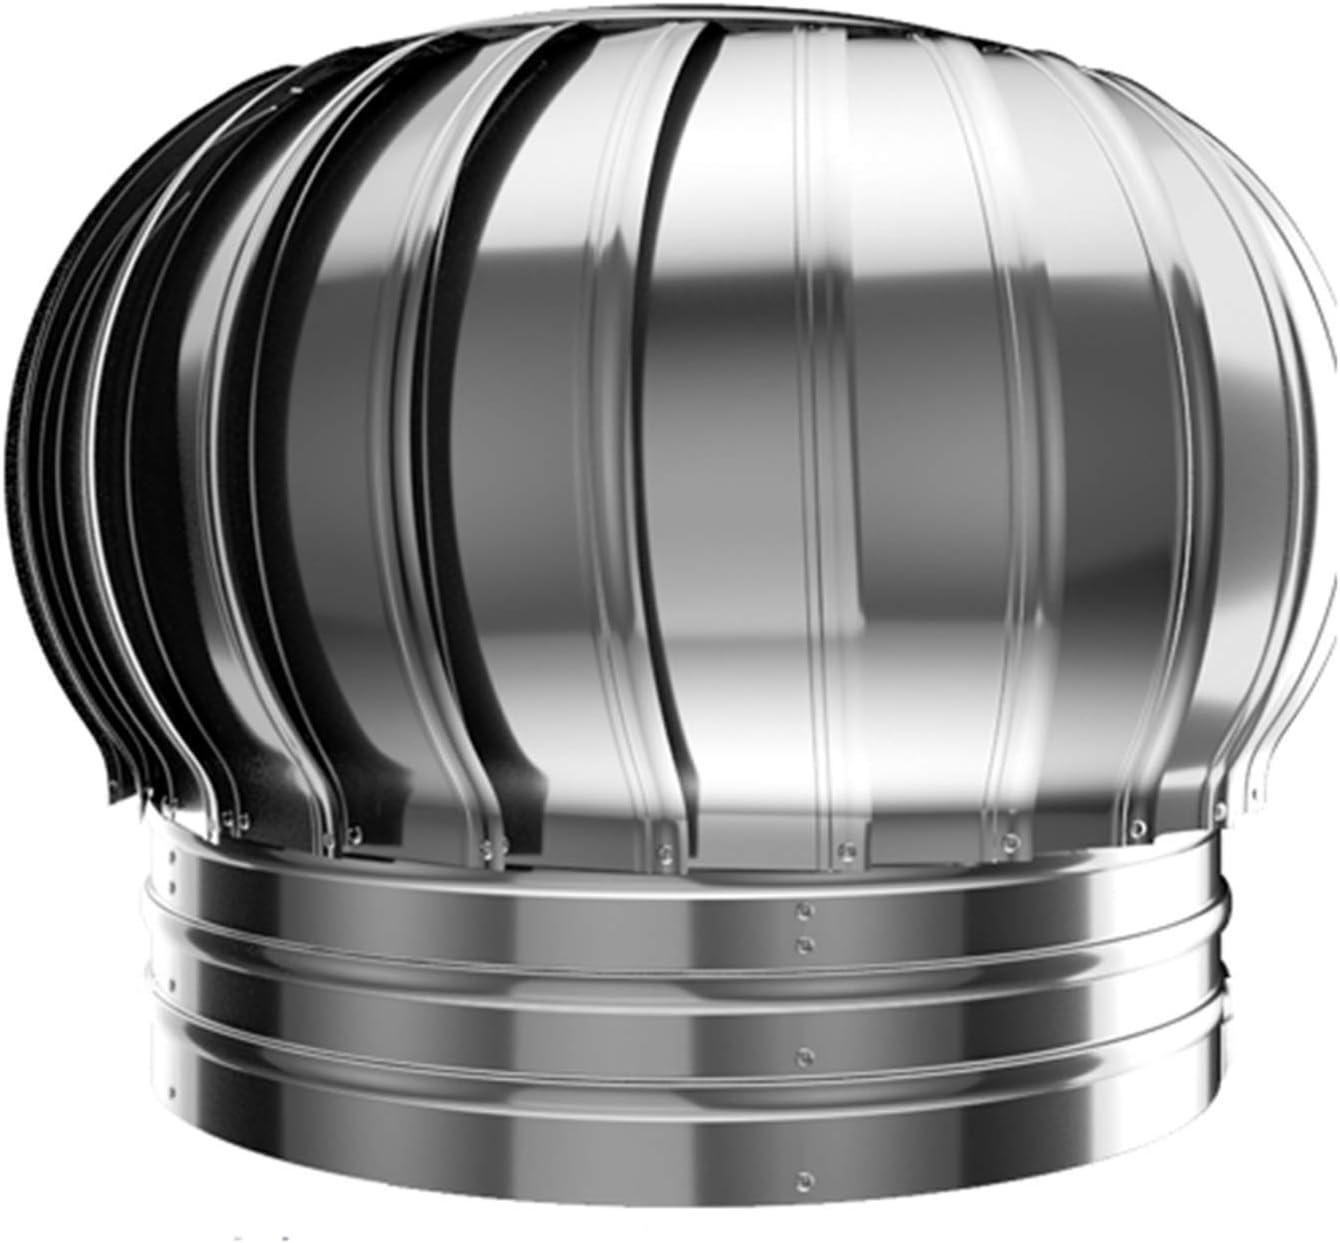 WYJW Spinner Giratorio de Acero Inoxidable para Tapa de Chimenea, Anti-Corriente, se Adapta a ollas de Chimenea estándar, Tapa de Olla de Chimenea, 100 mm